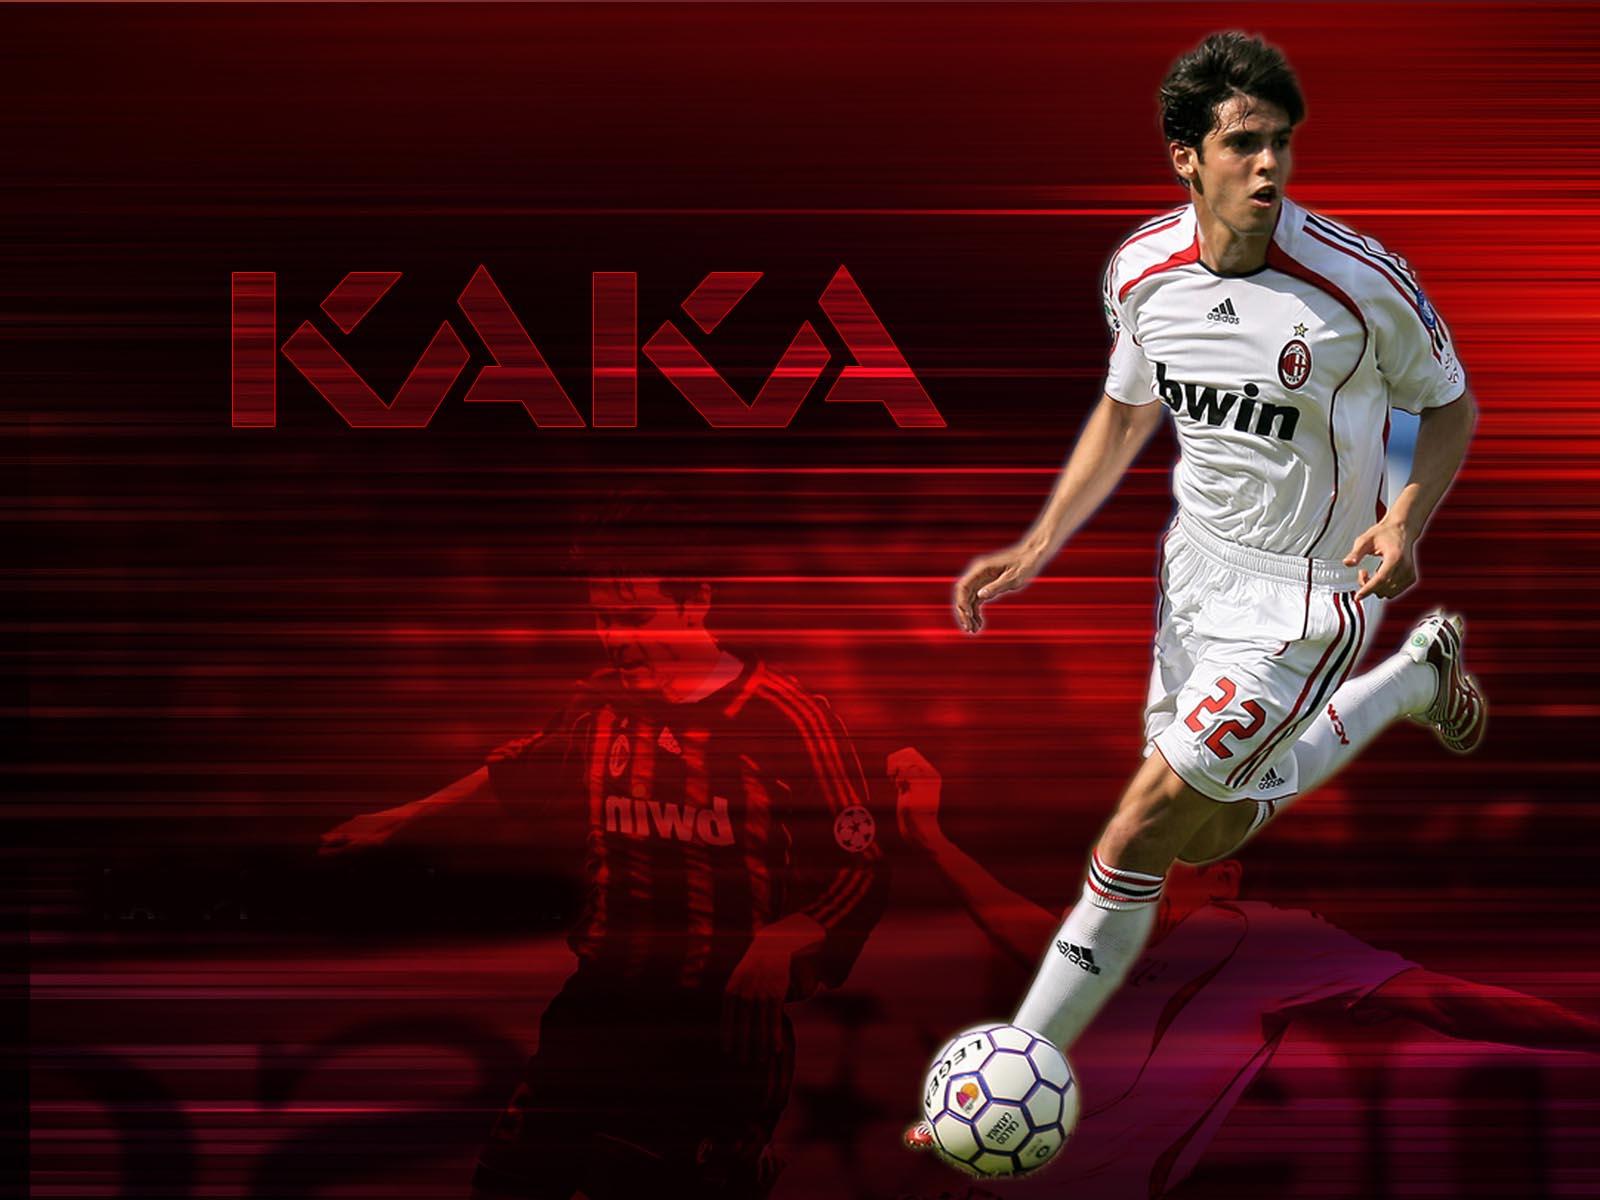 Kaka Real Madrid Latest HD Wallpaper 2013 Latest Hd Wallpapers 1600x1200